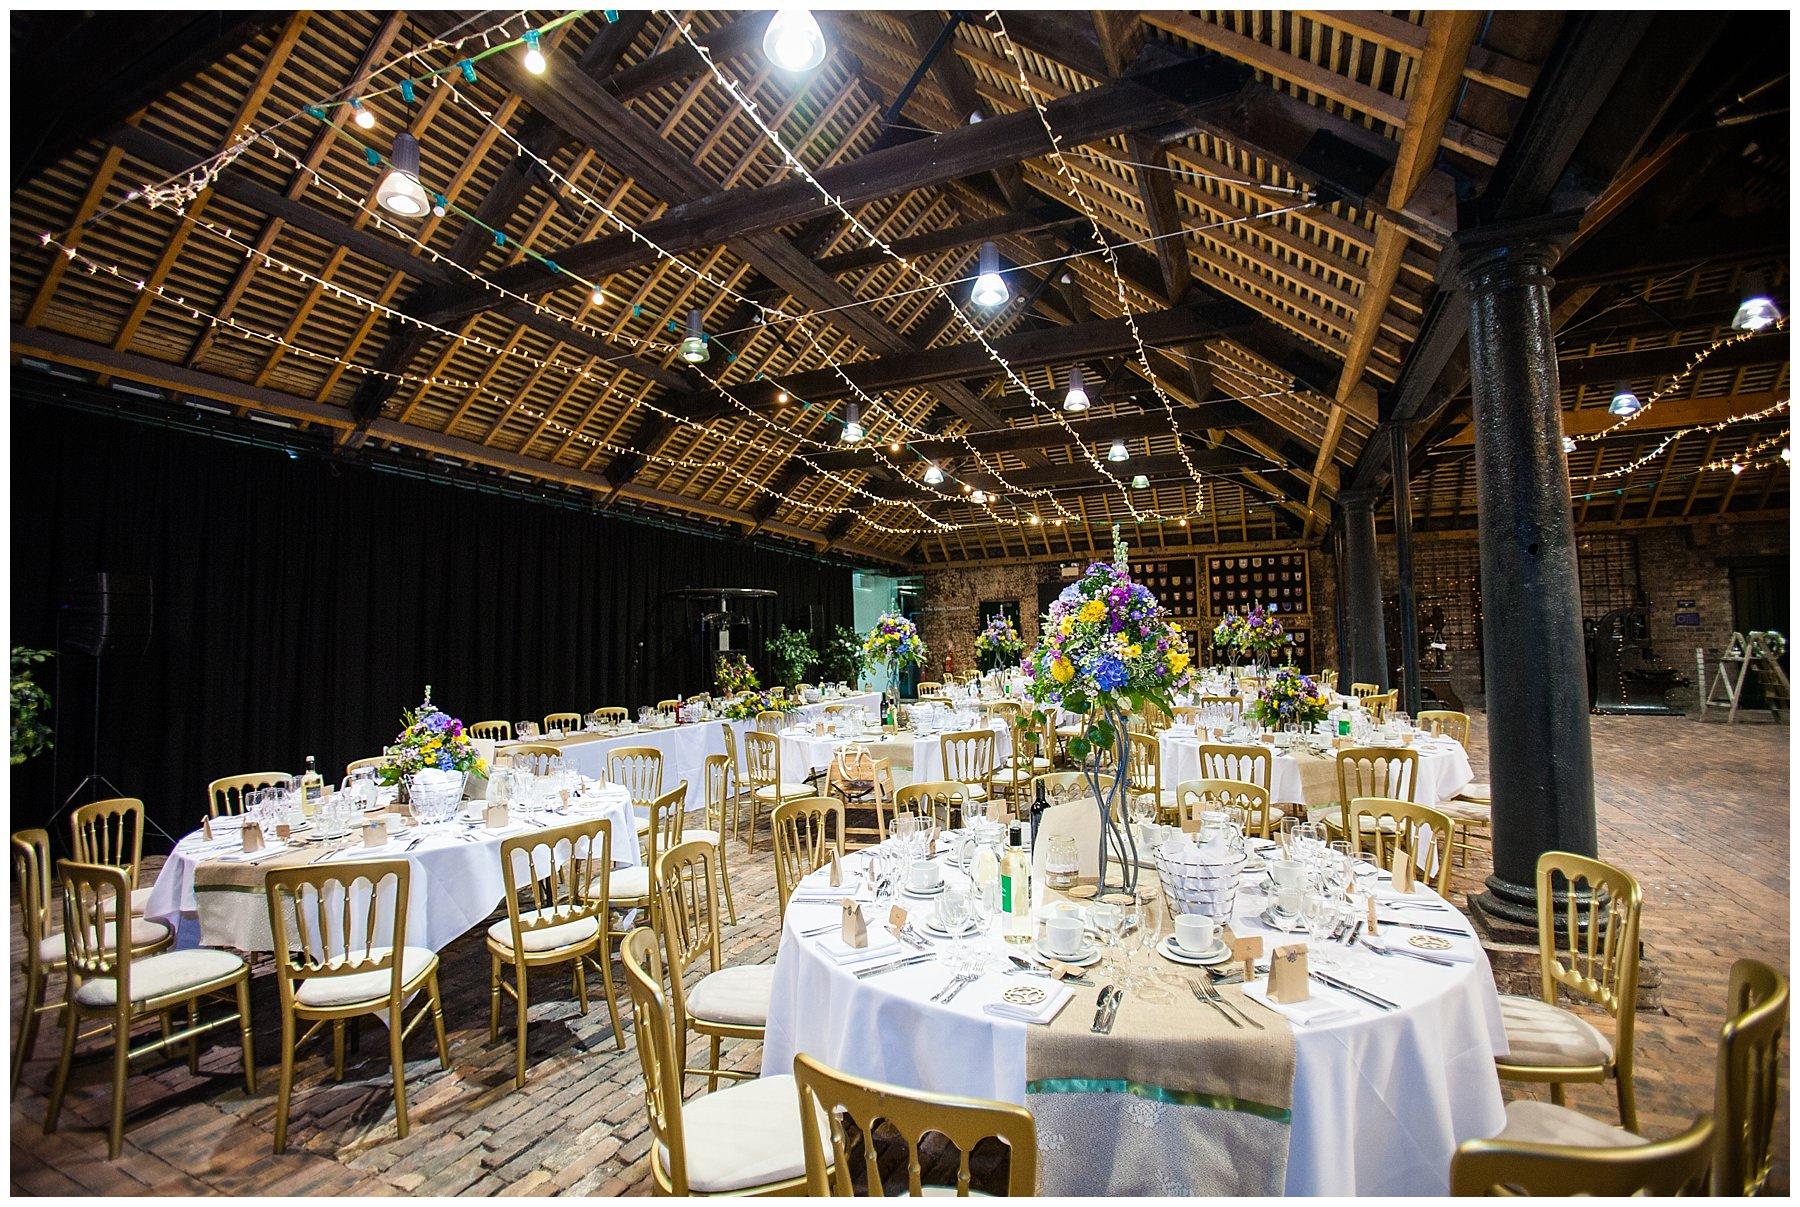 ironbridge museaum set up for wedding breakfast - april wedding